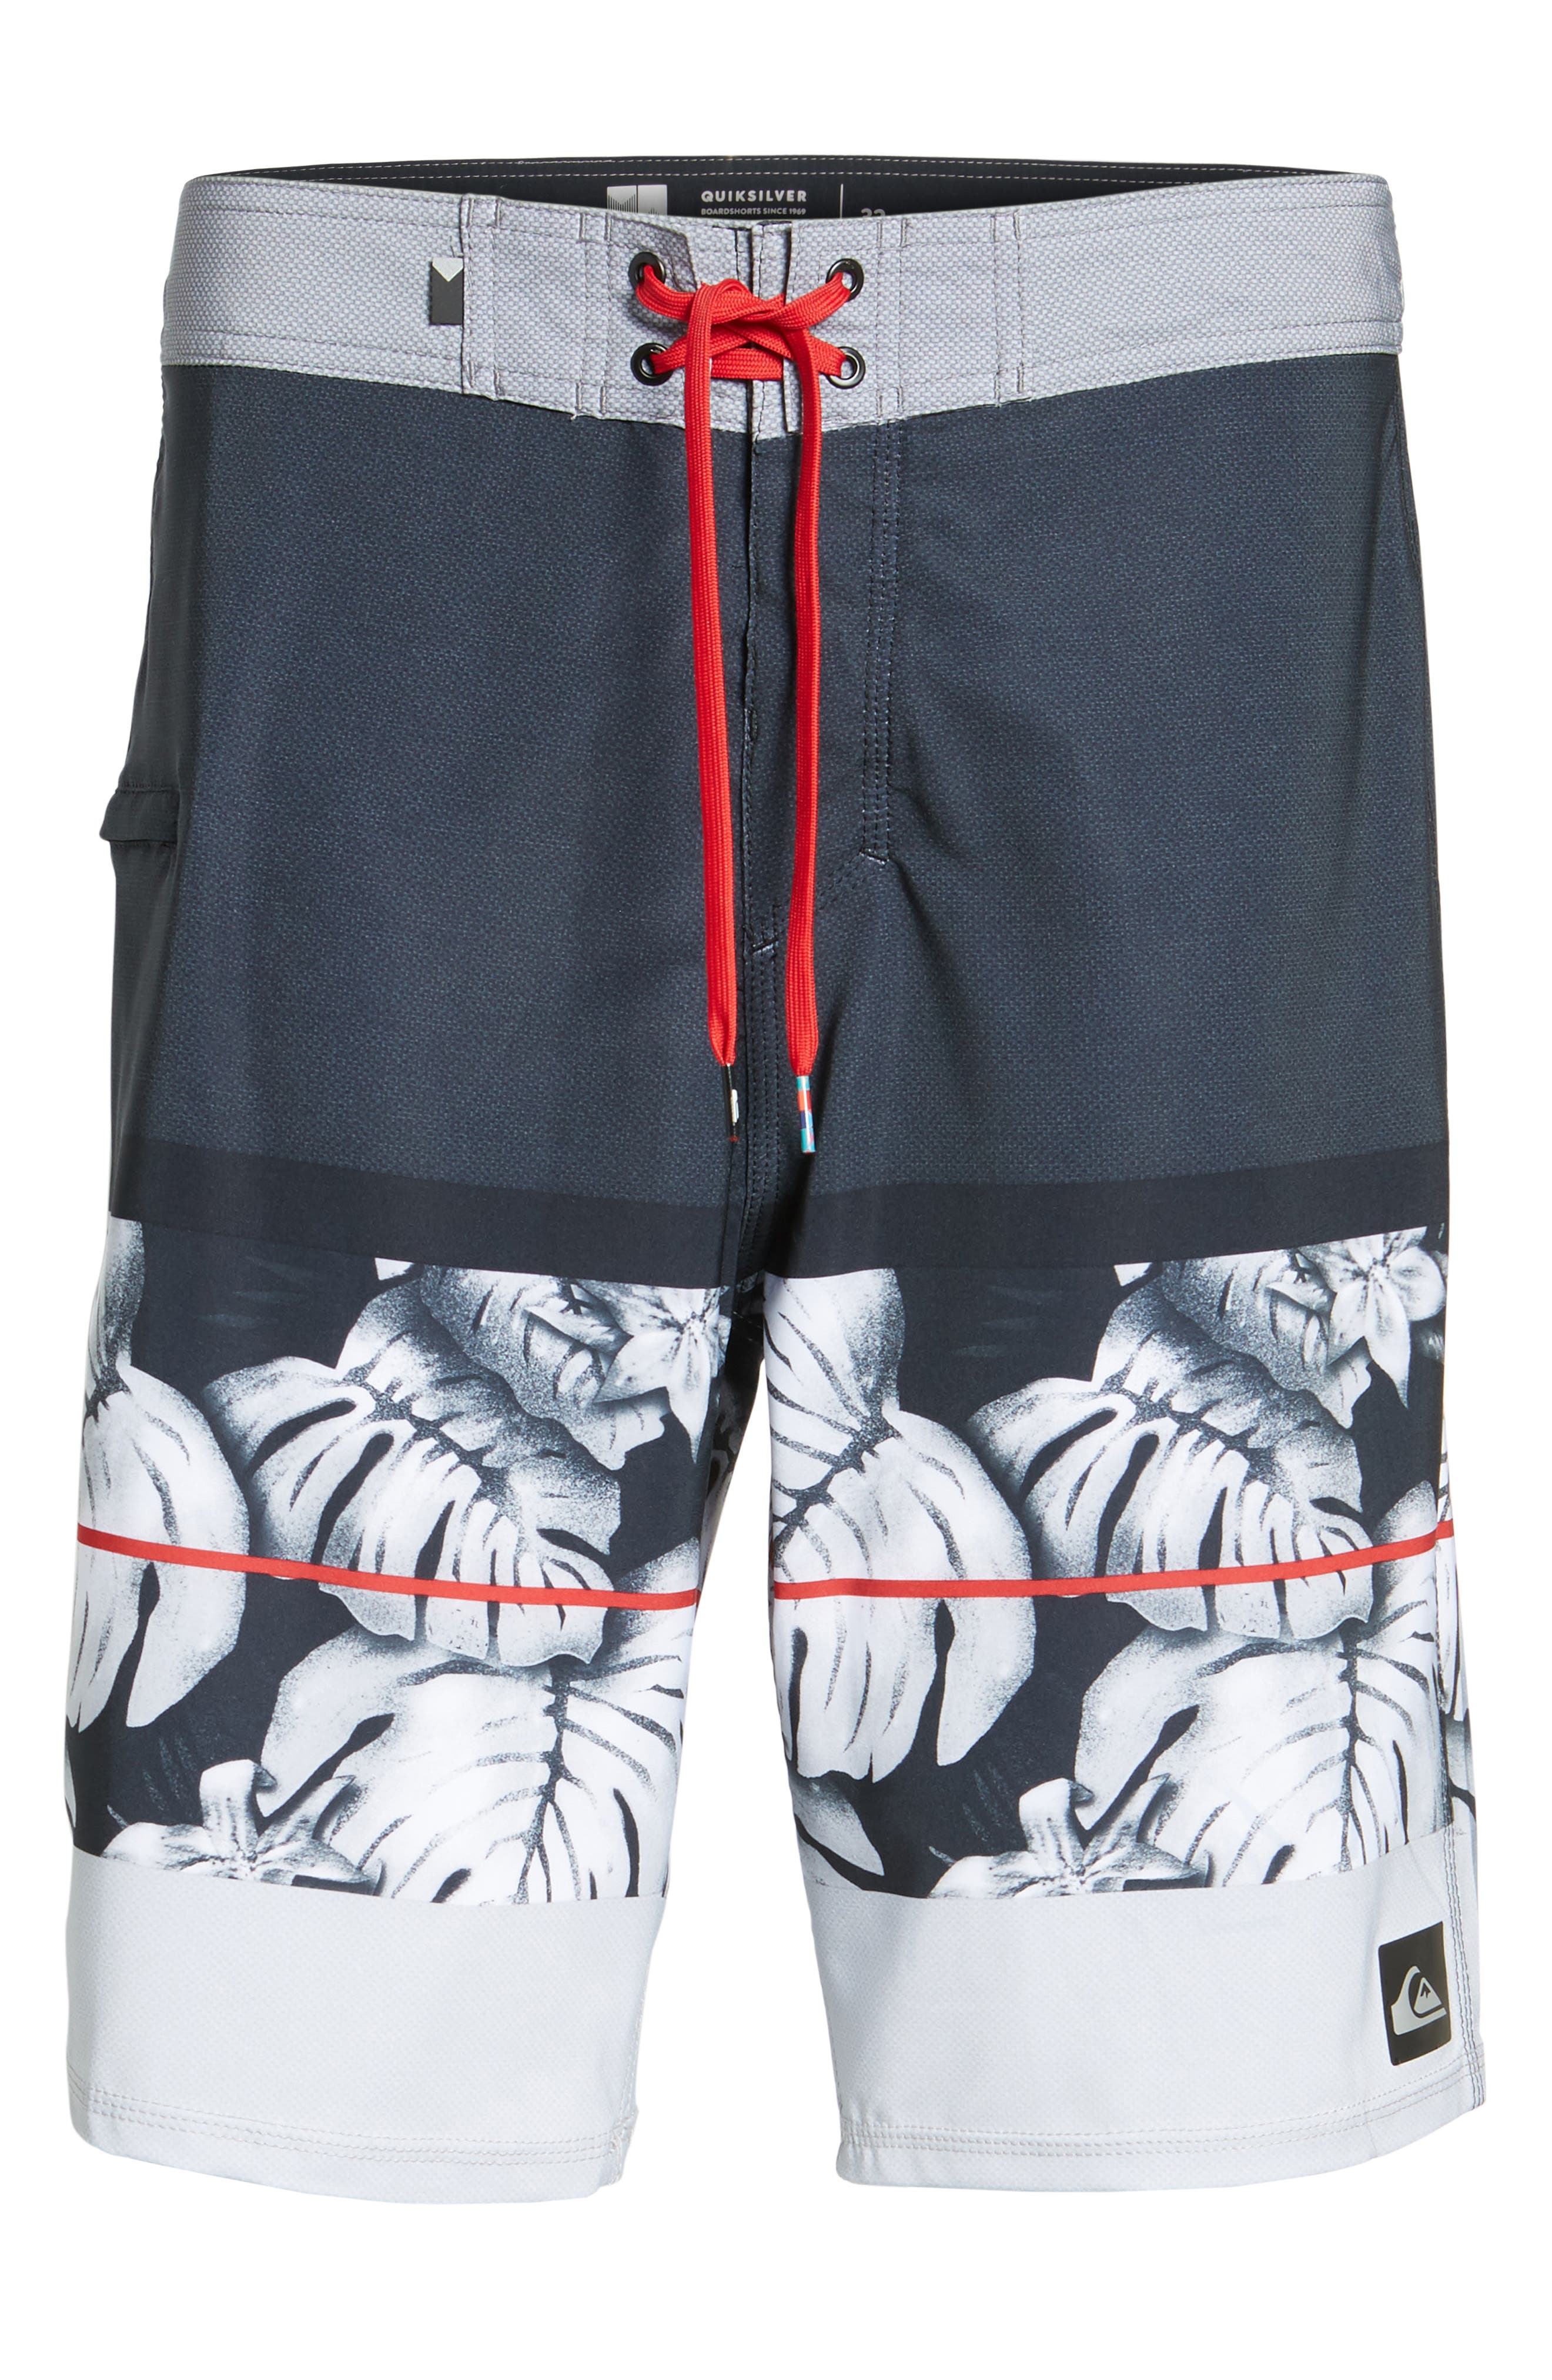 Slab Vee 21 Board Shorts,                             Alternate thumbnail 6, color,                             002